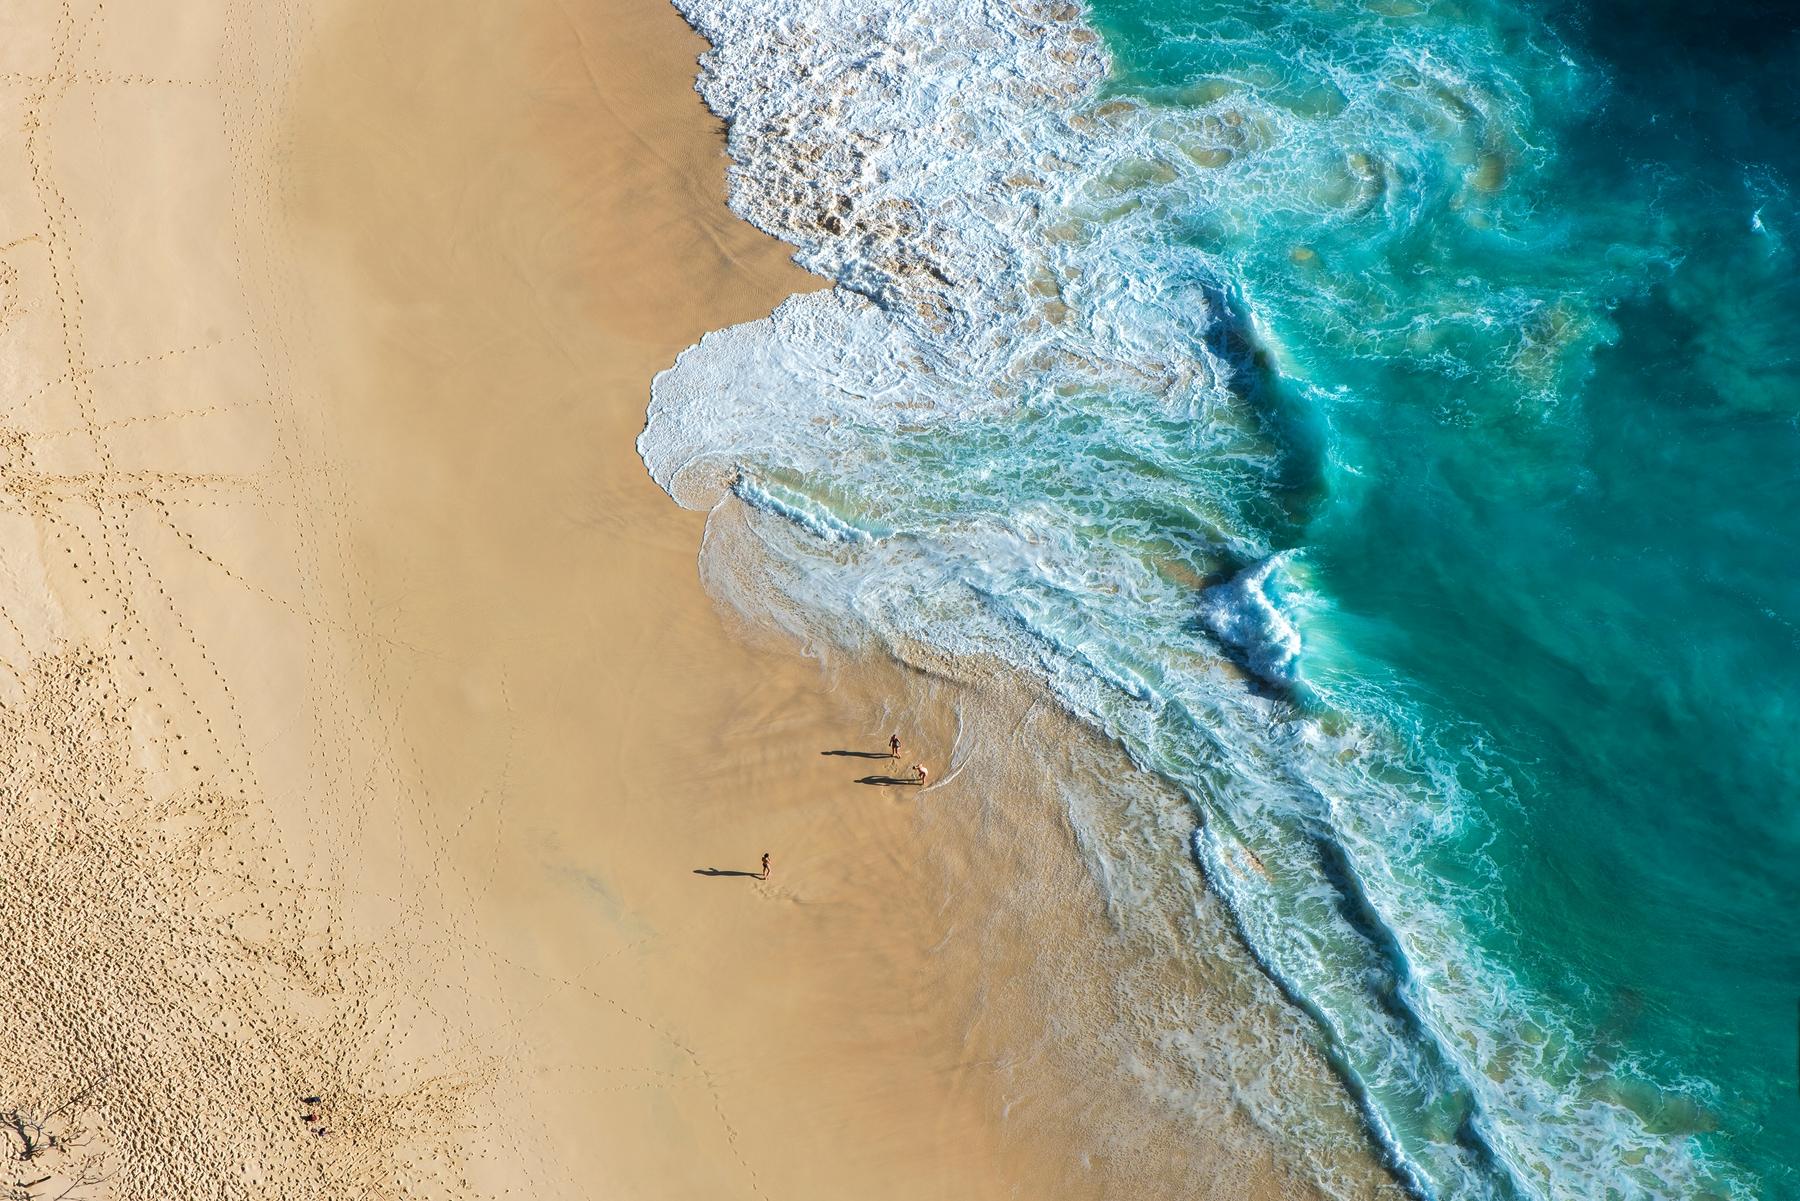 Куда в Азии поехать на море зимой. Тропический пляж Каранг Дава (Karang Dawa) в бухте Манта-Бэй (Manta Bay), Бали, Индонезия